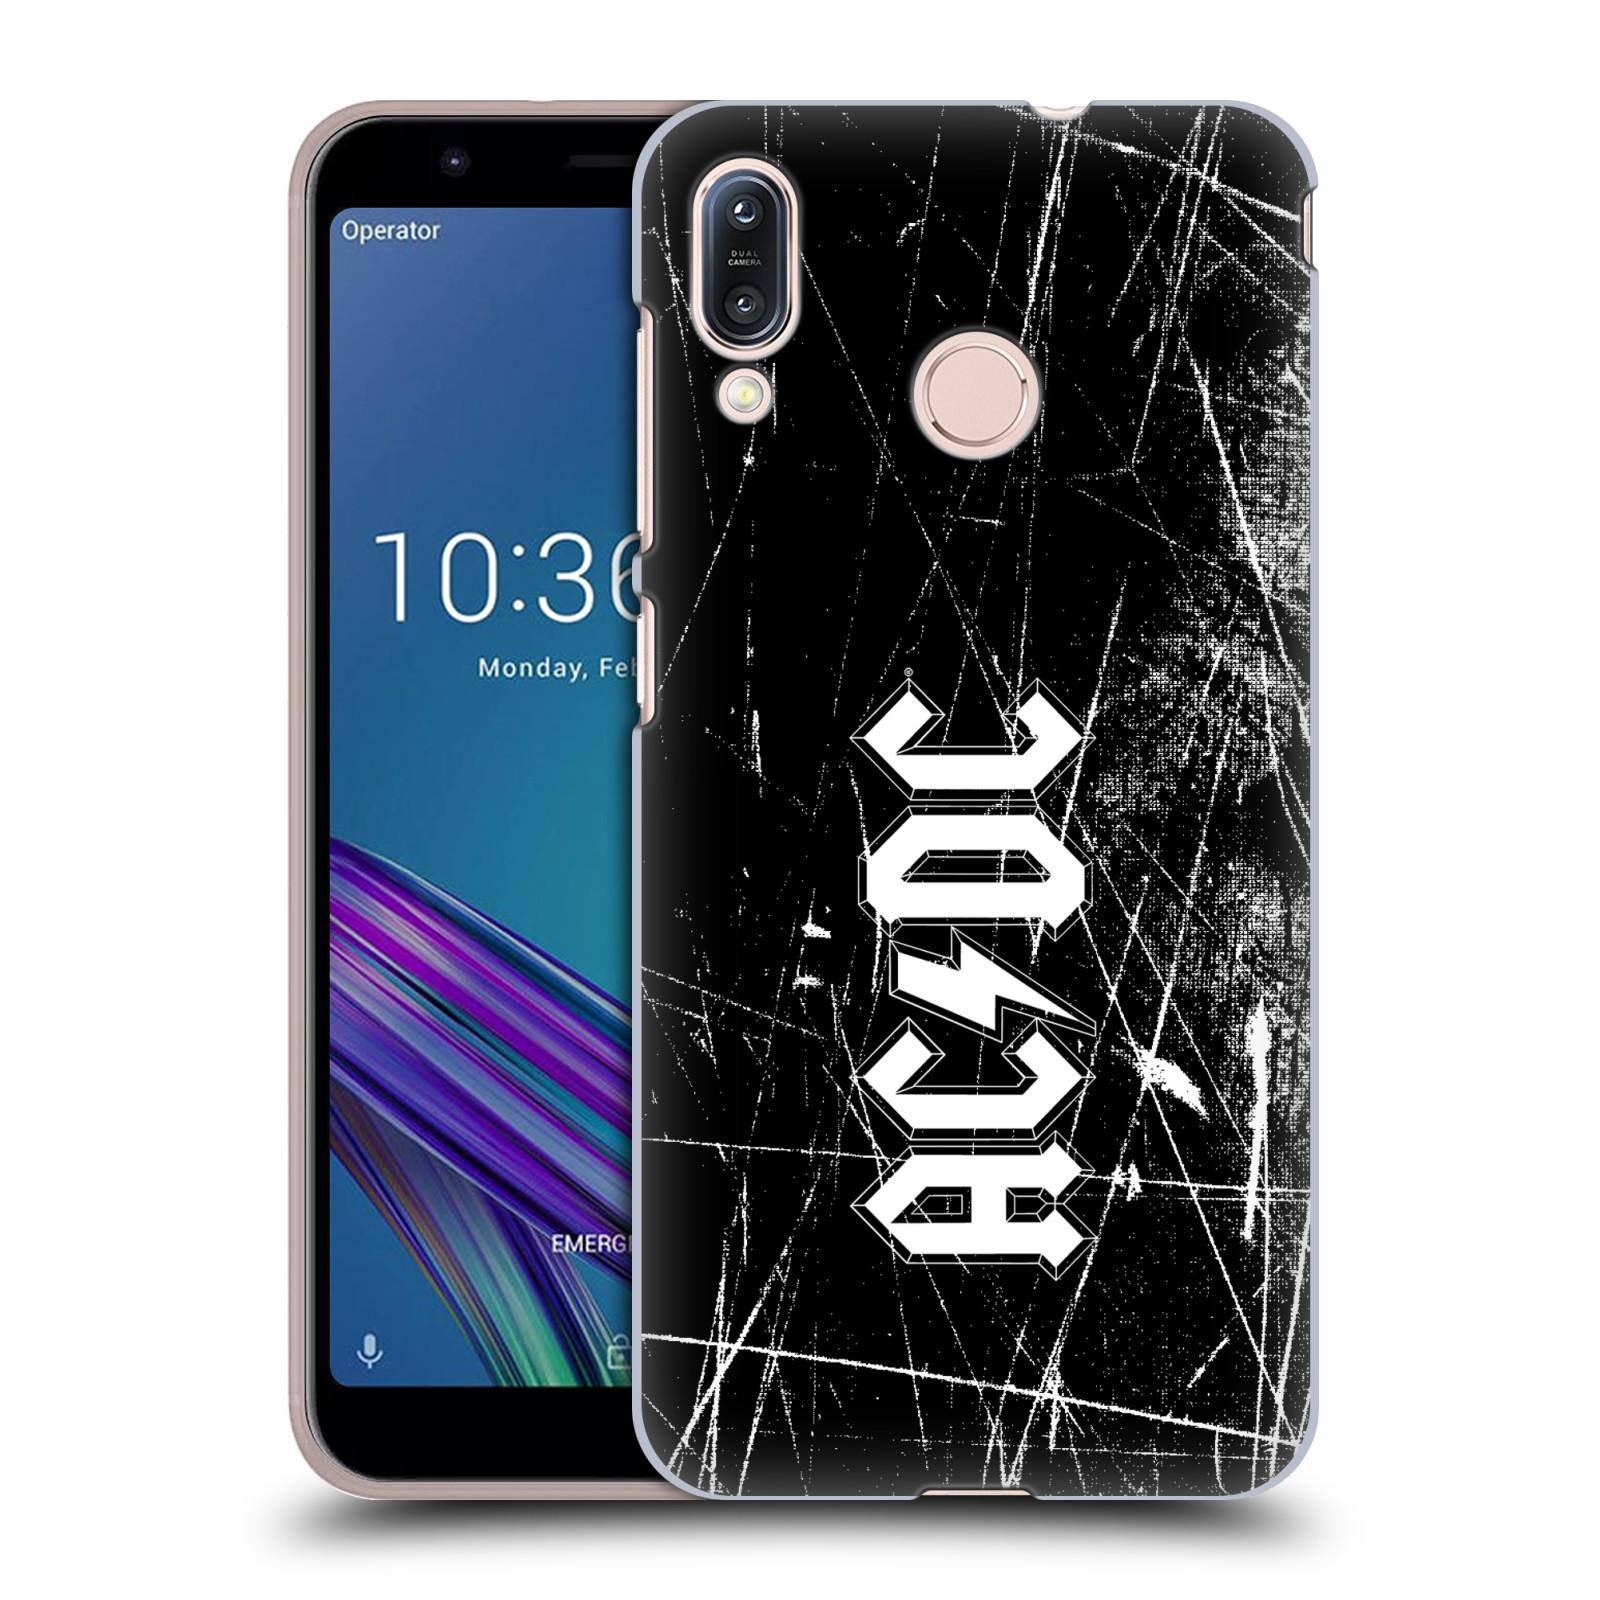 Plastové pouzdro na mobil Asus Zenfone Max M1 ZB555KL - Head Case - AC/DC Černobílé logo